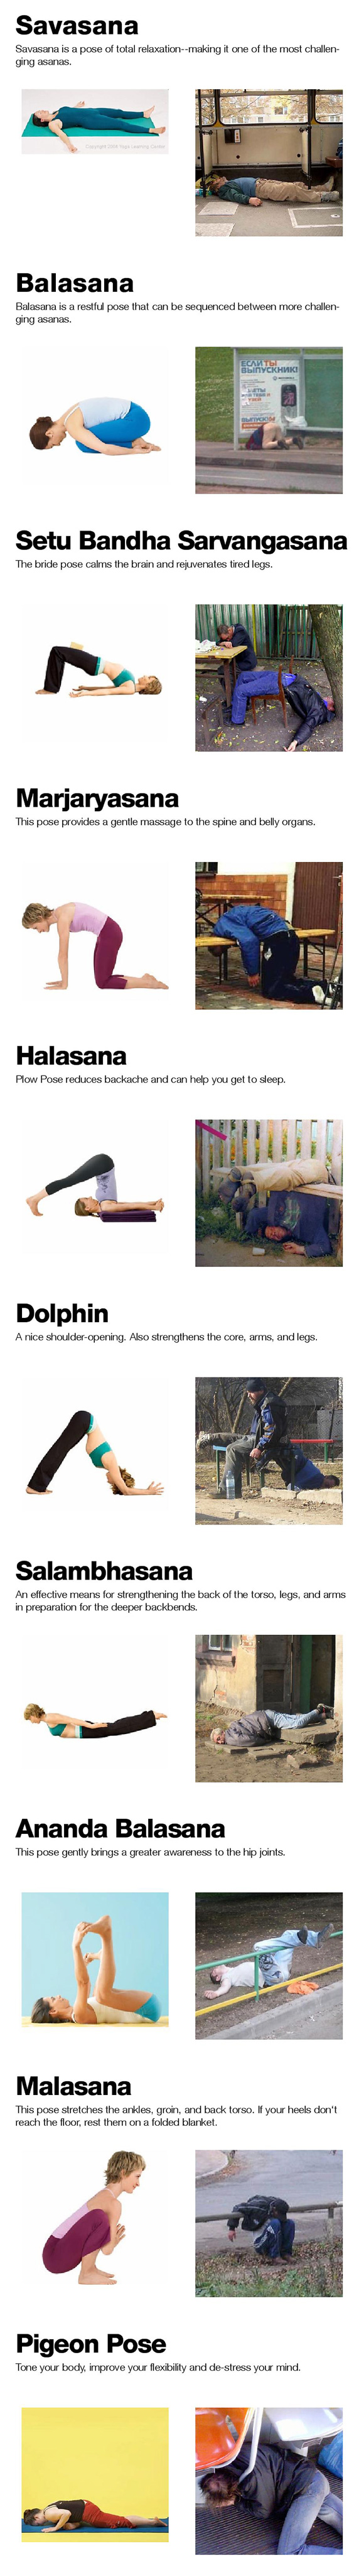 Yoga VS. Drinking: Same thing!